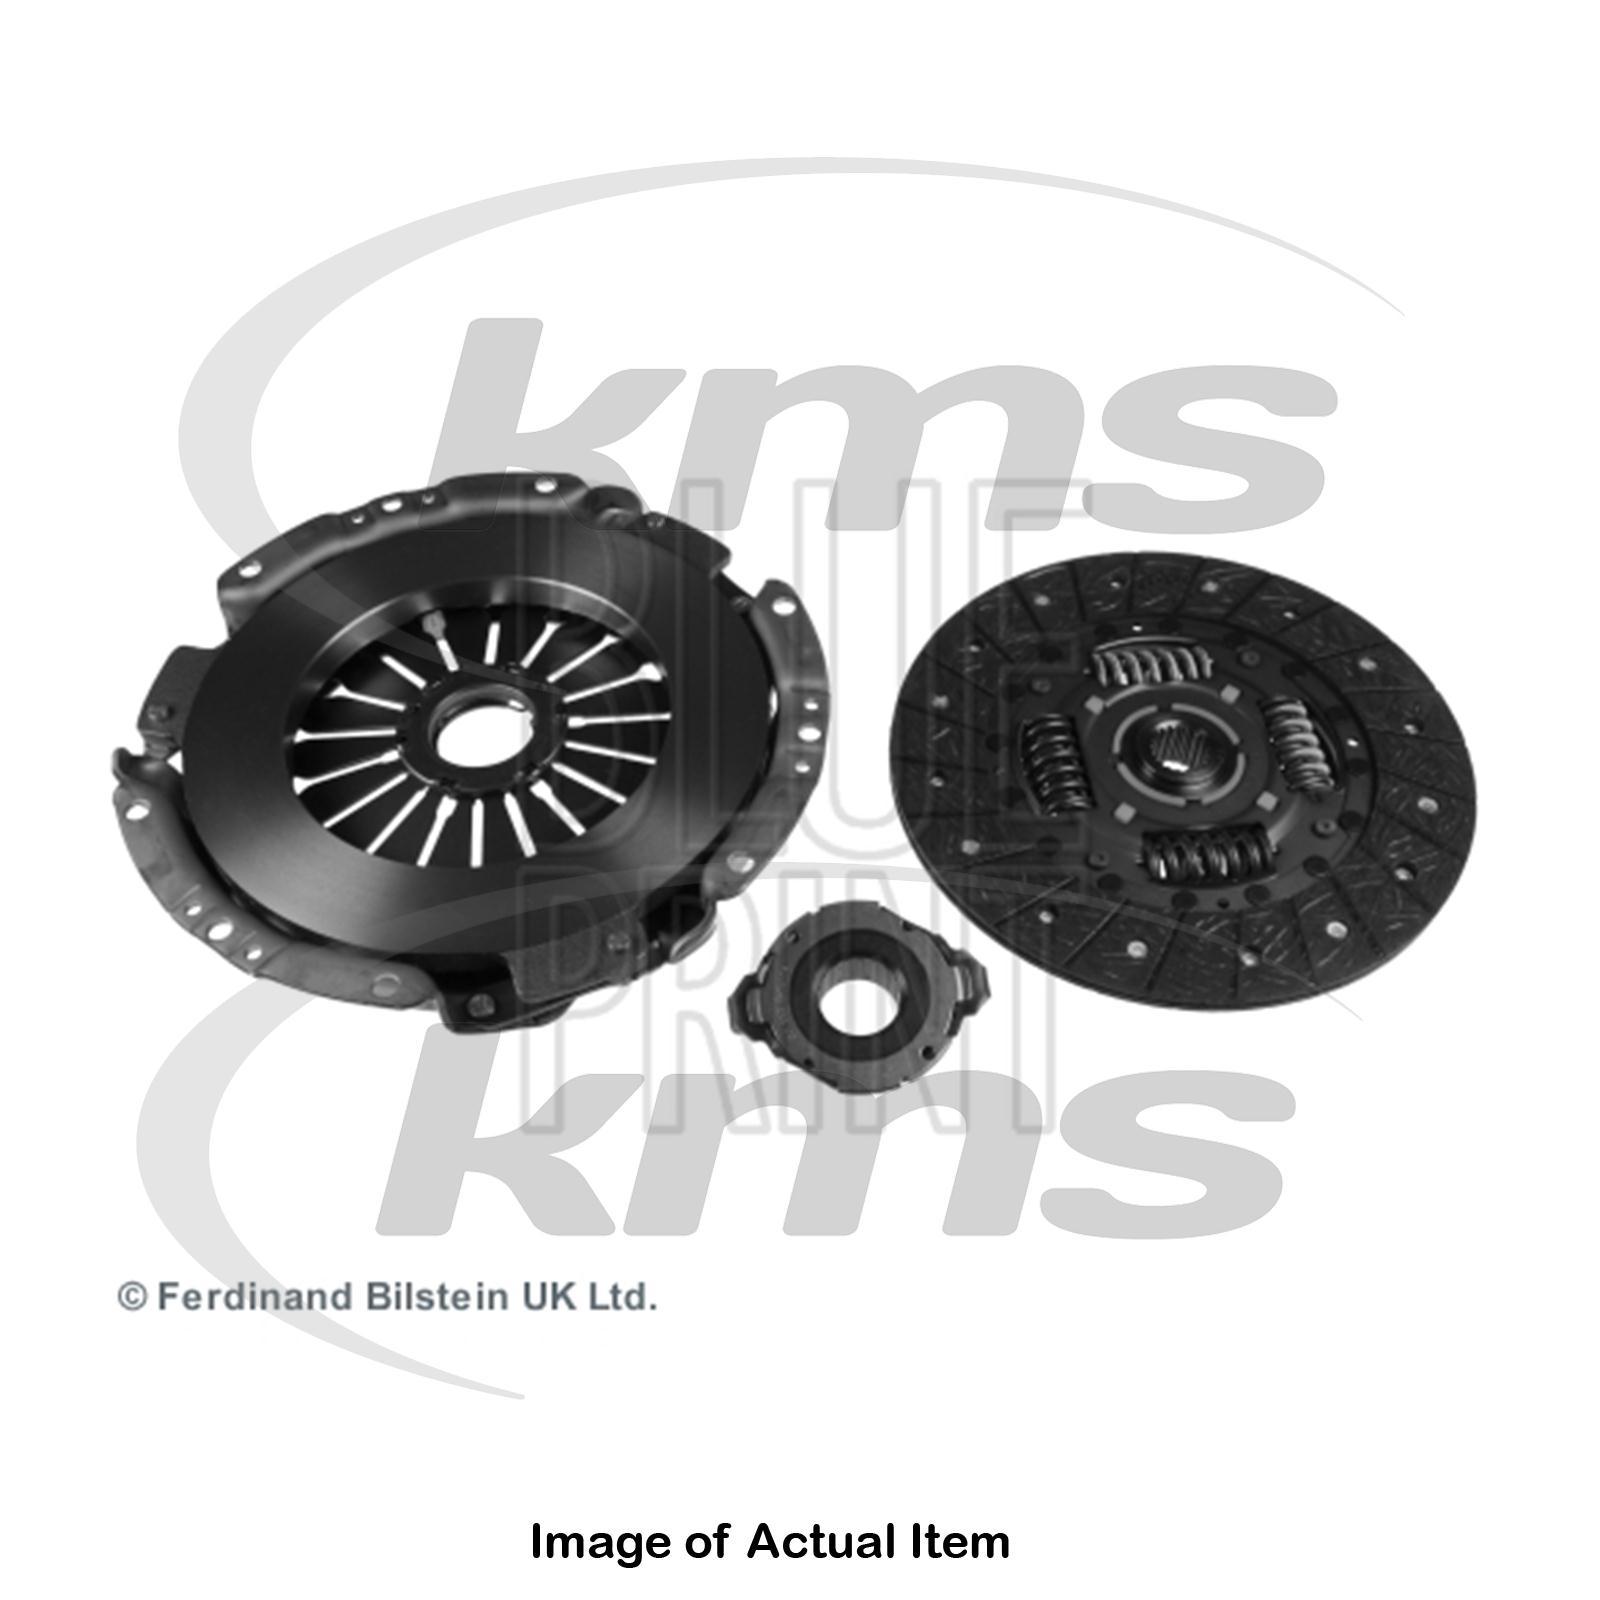 Genuine Hyundai 41100-28060 Clutch Disc Assembly